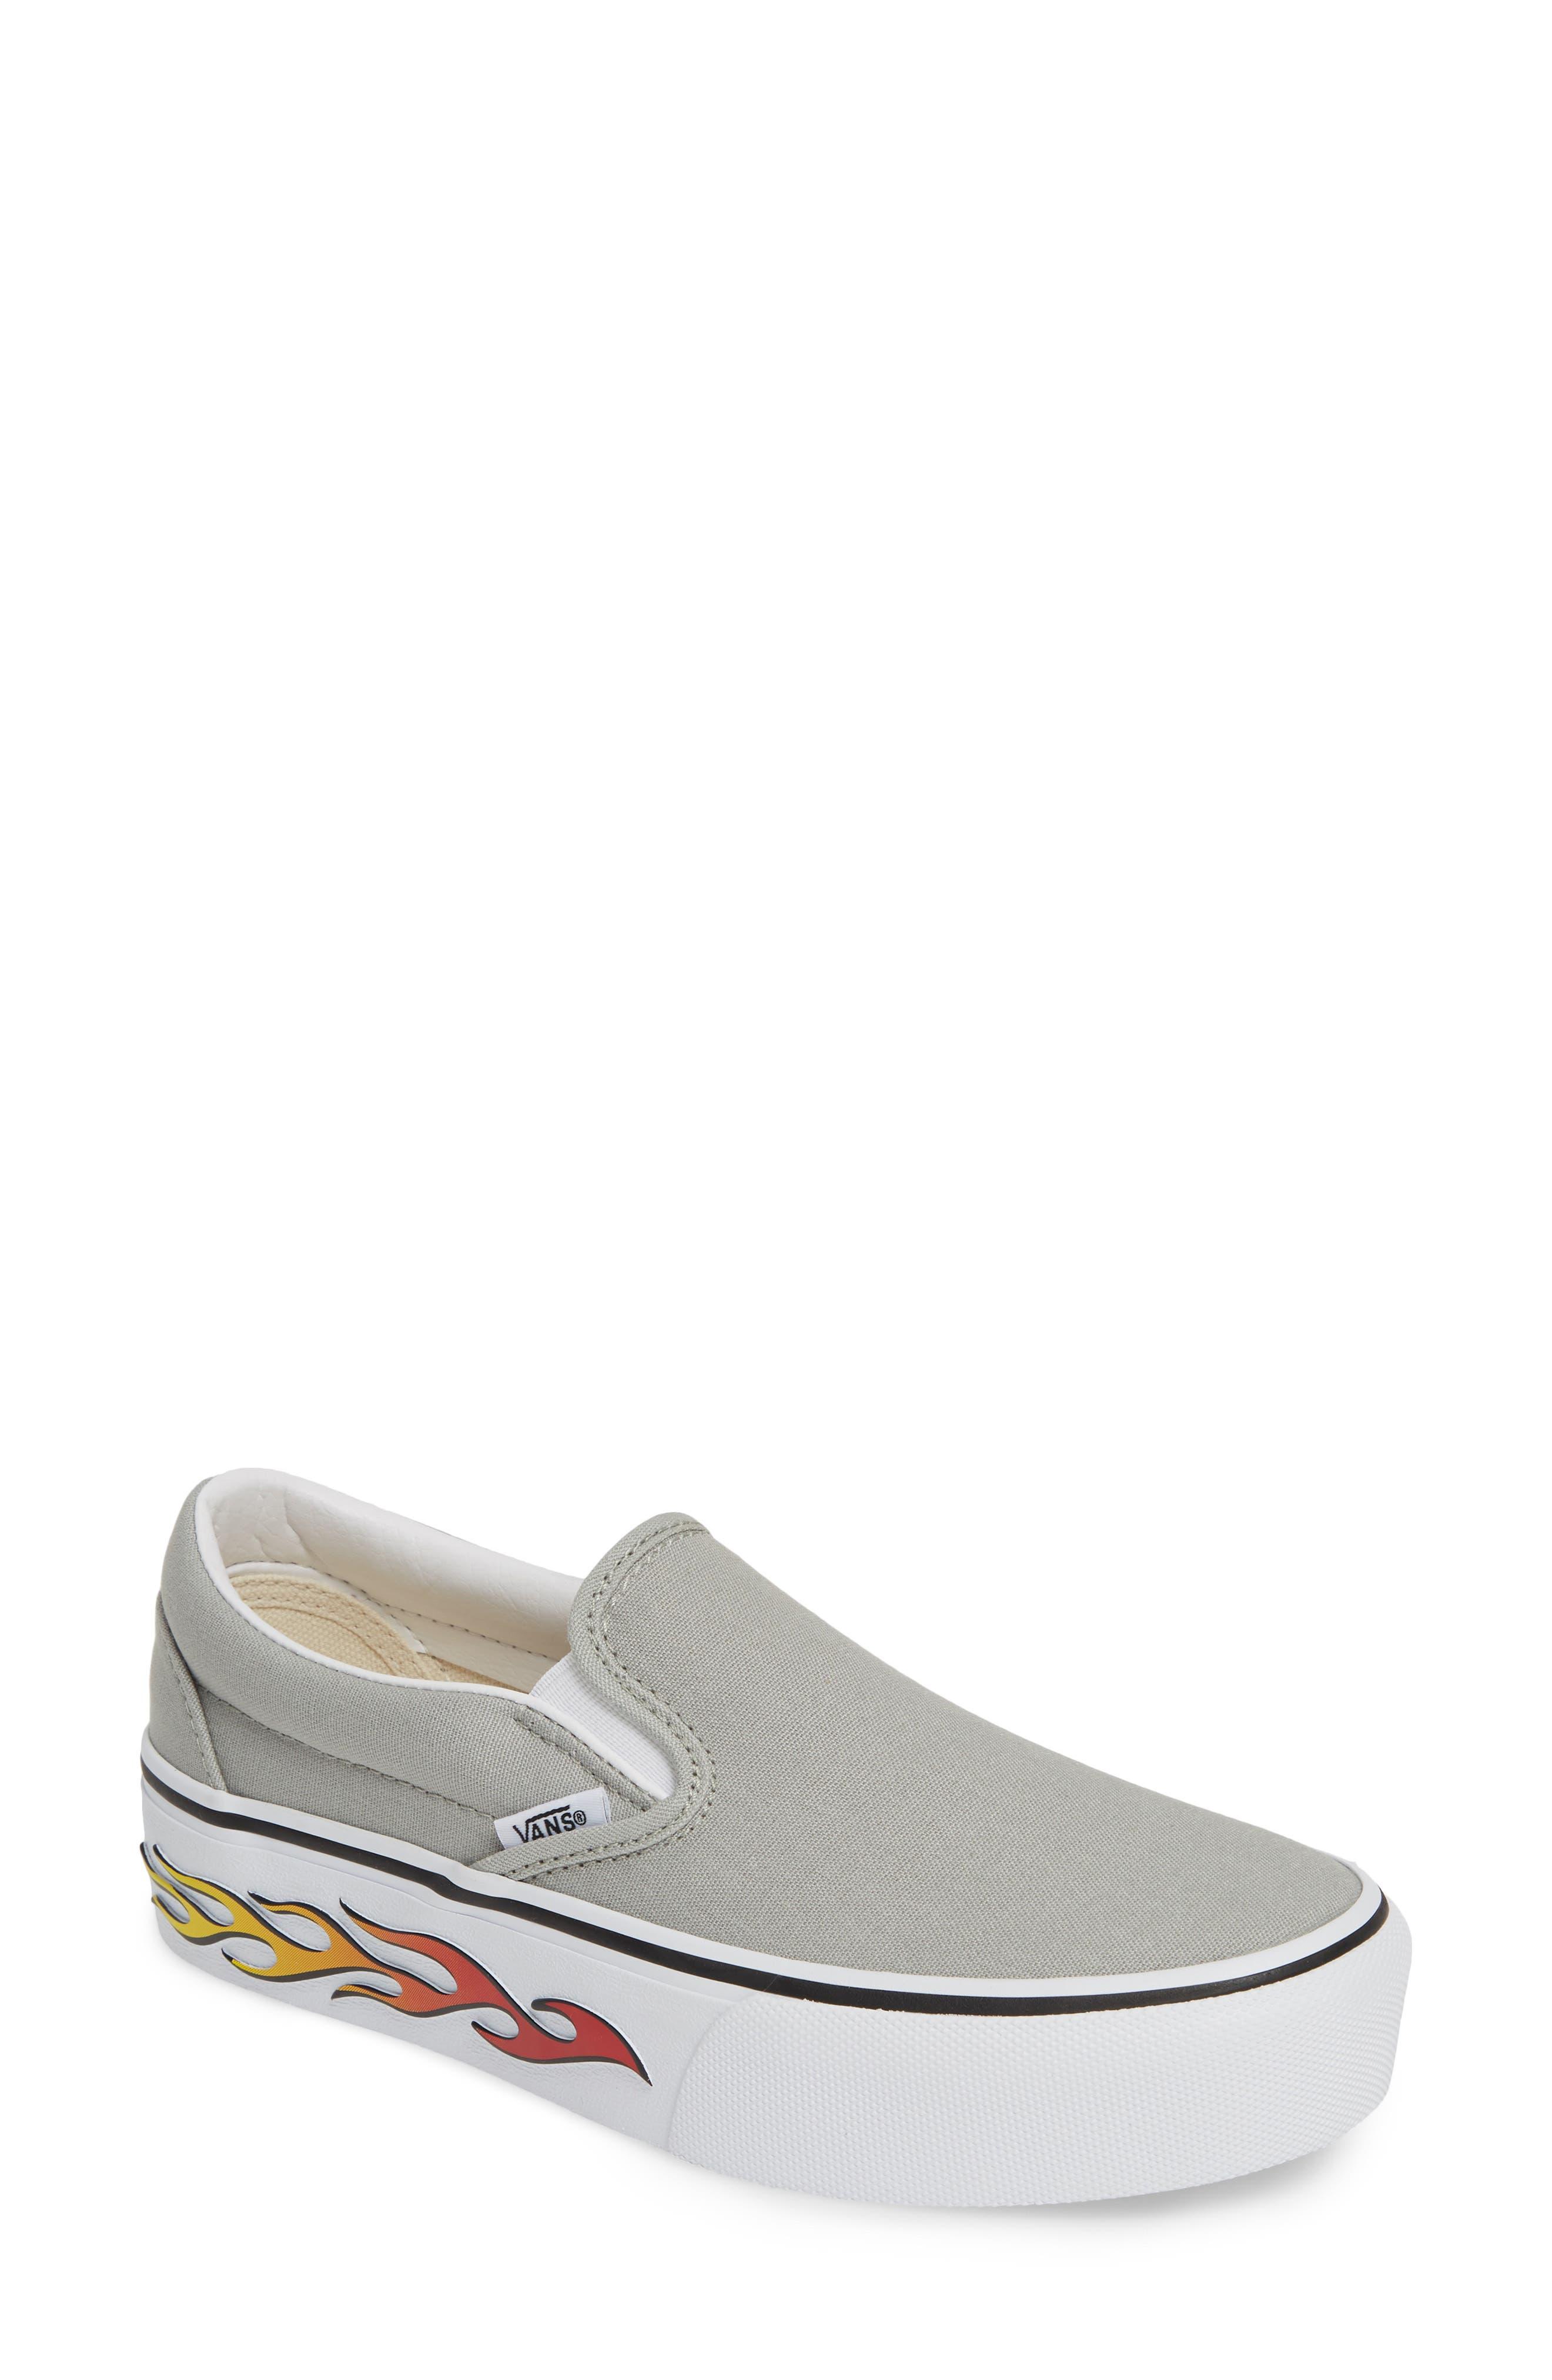 Vans Platform Slip-On Sneaker, Grey